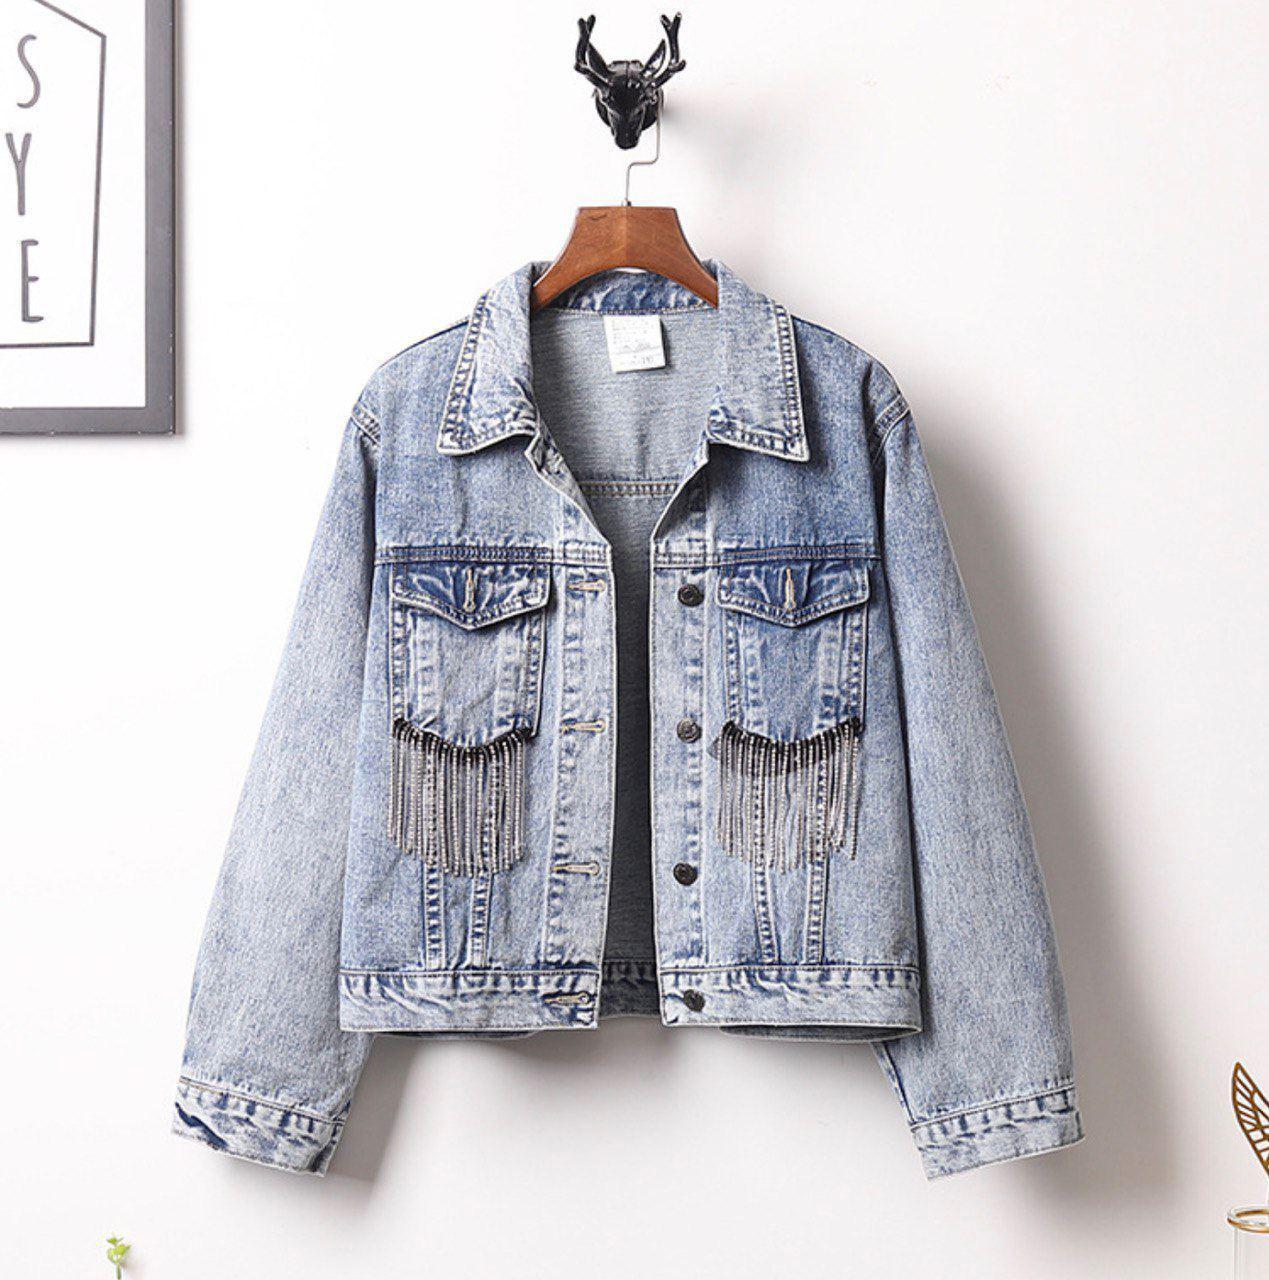 Женская короткая джинсовая куртка оверсайз с бахрамой из страз на карманах 6801336